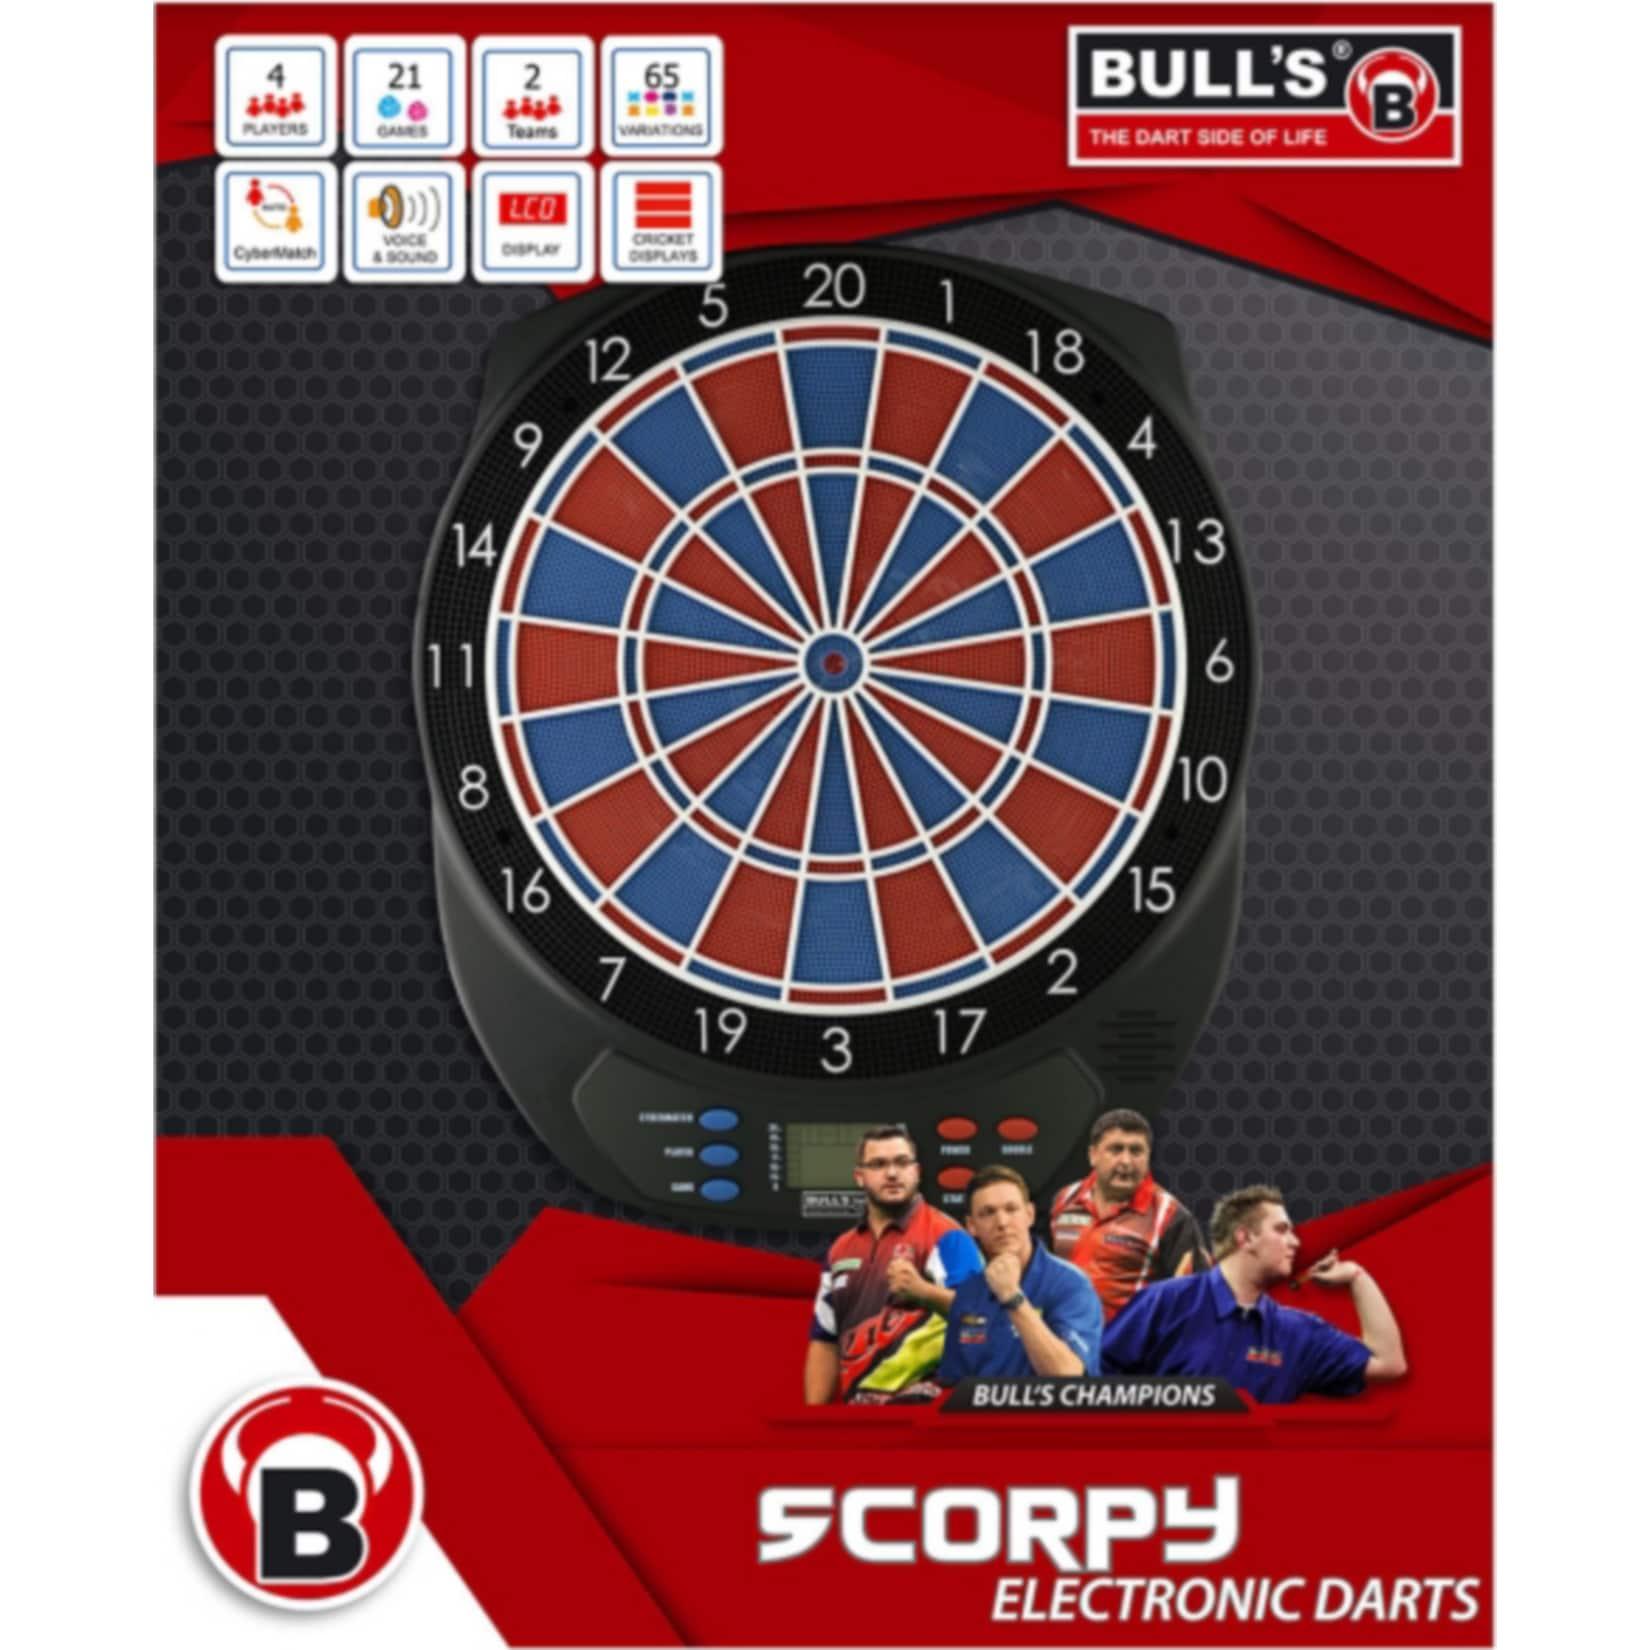 Bulls Bull s E-Dart-Scorpy Zweiloch